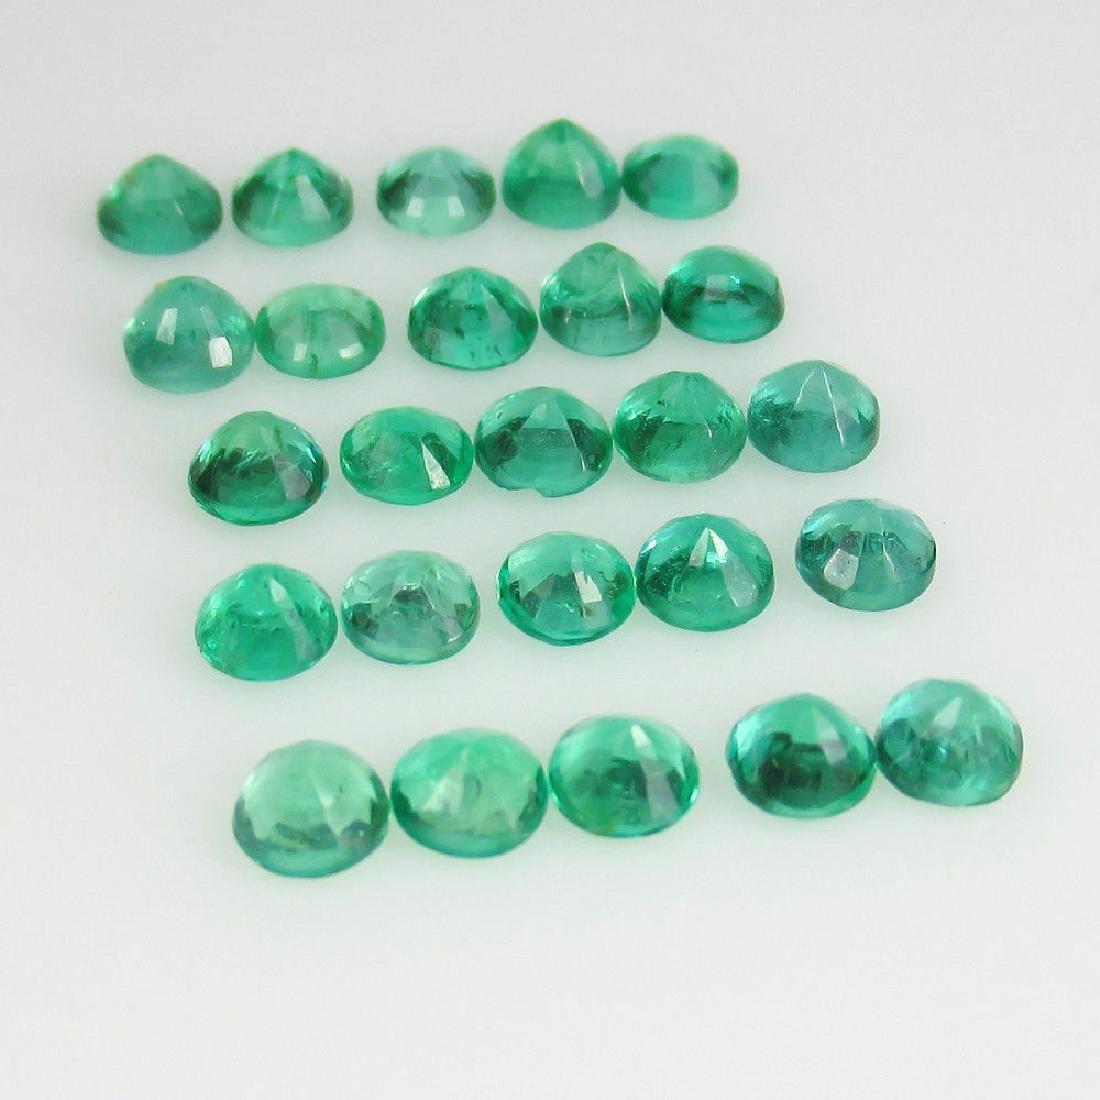 4.04 Ctw Natural 25 Loose Calibrate Emerald 3.5 mm - 2